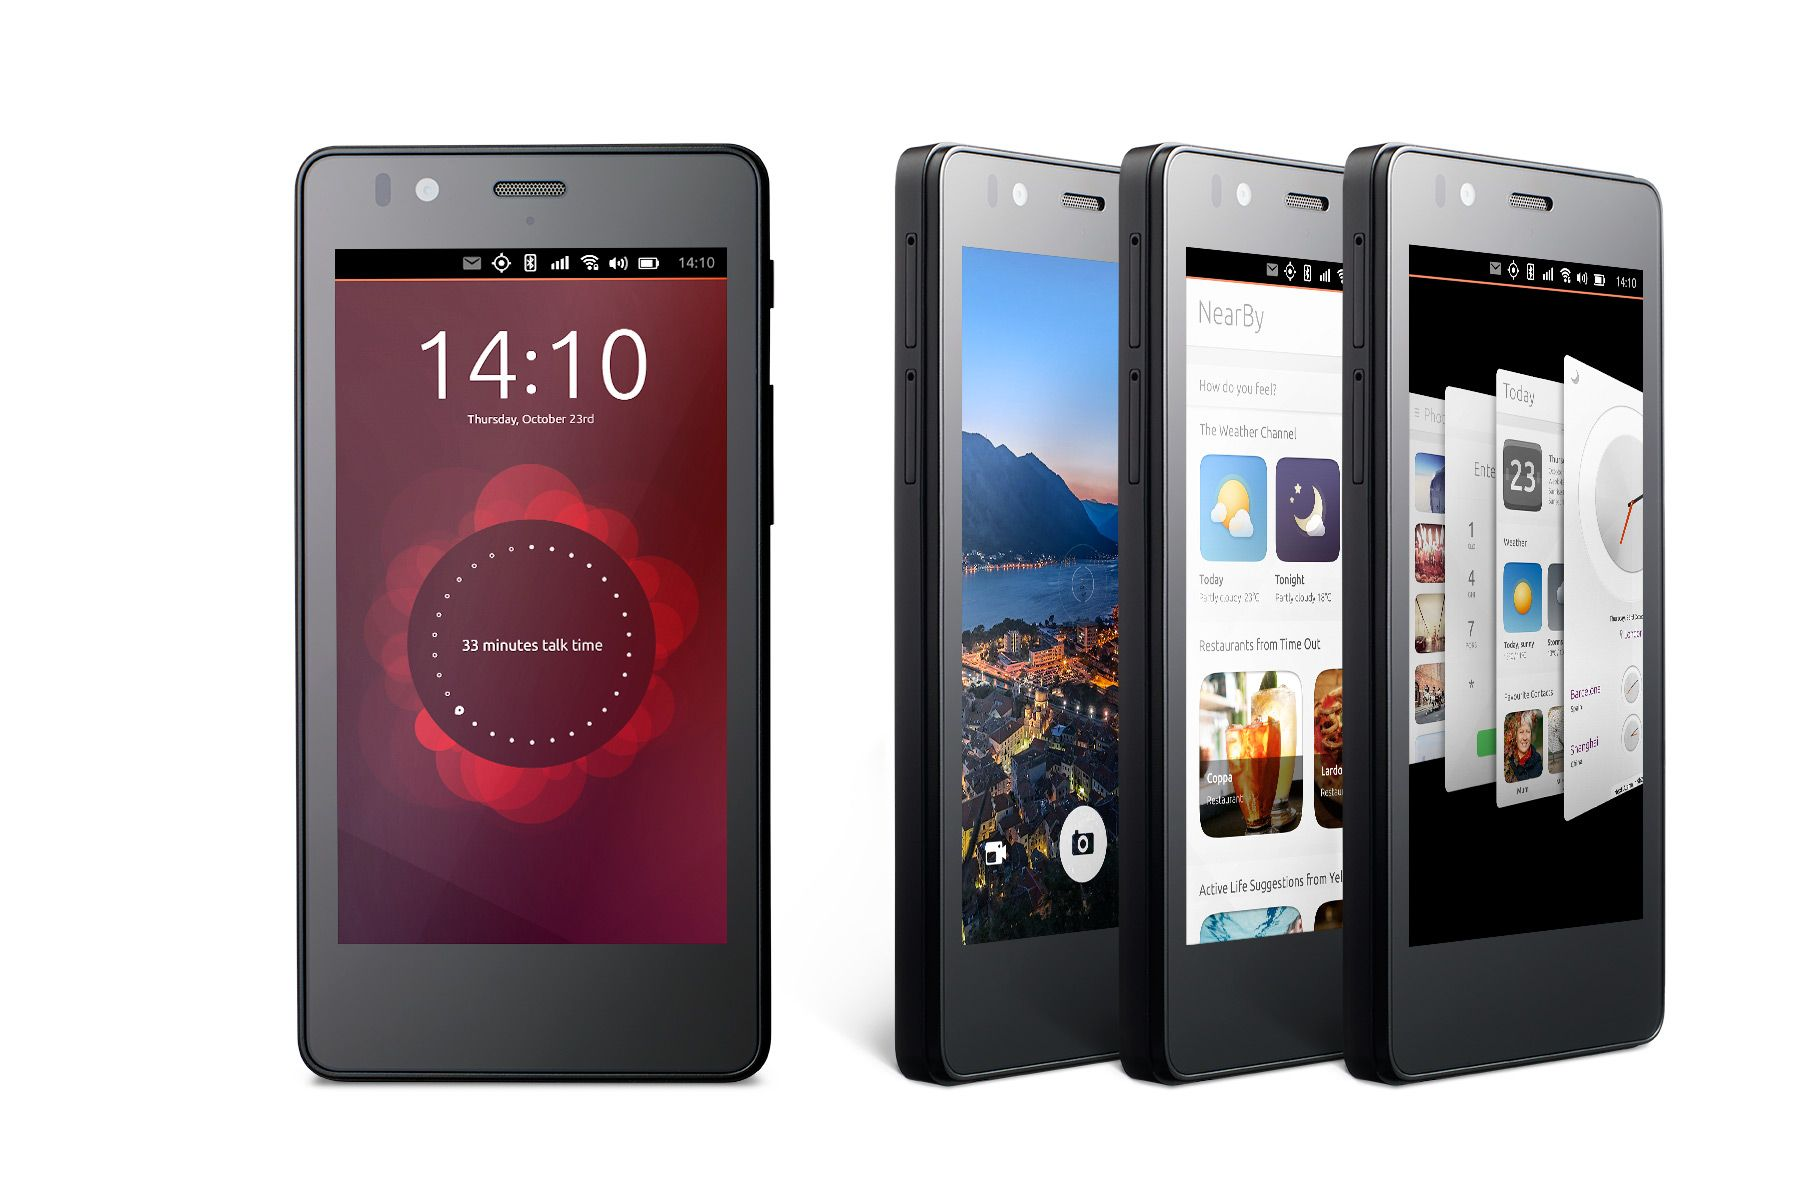 ubuntu-phone-060215-3